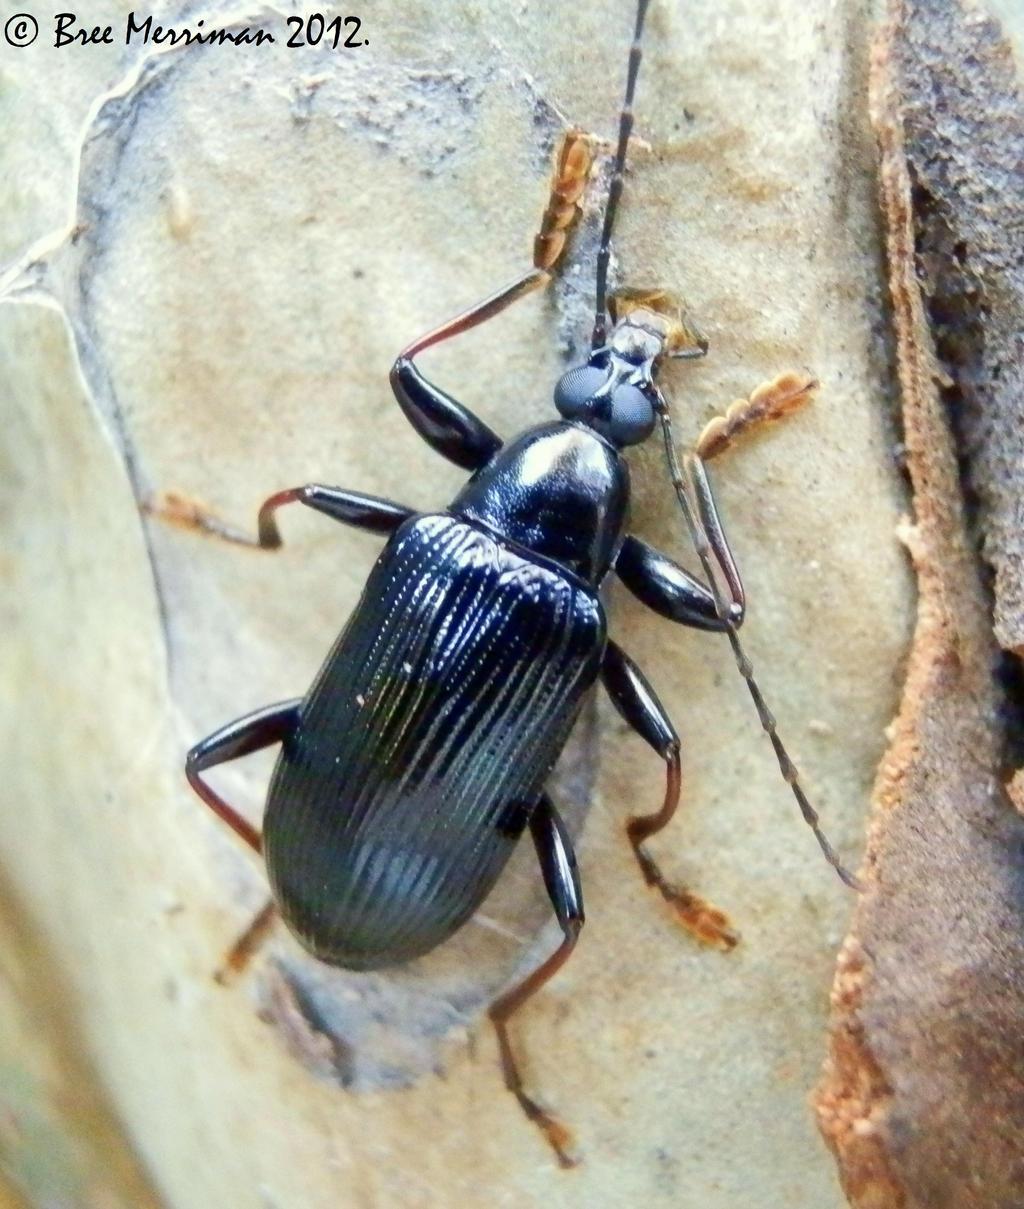 Blister Beetle by BreeSpawn